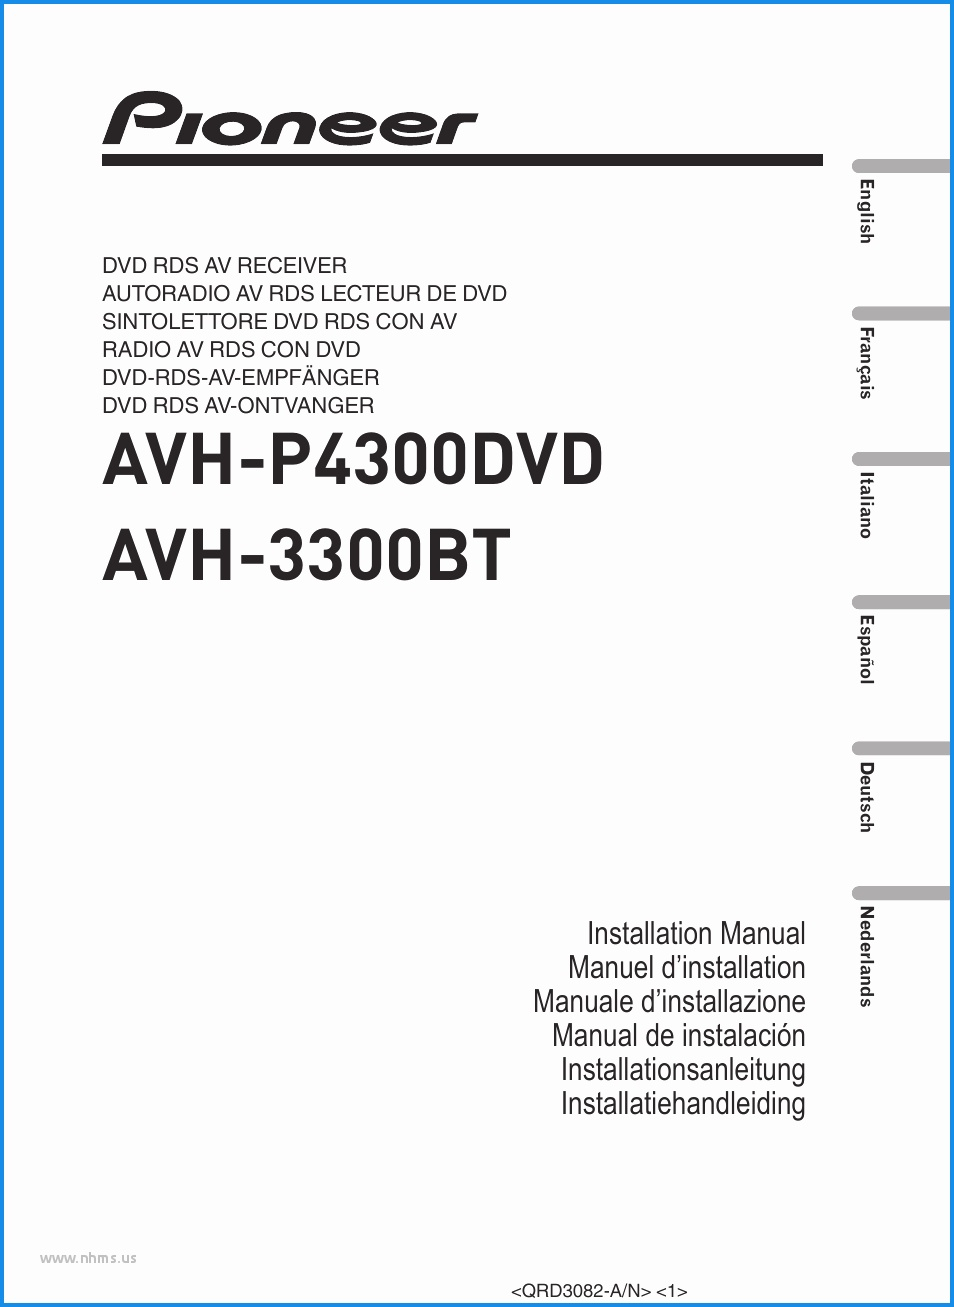 medium resolution of pioneer avh p2300dvd wiring diagram all wiring diagram pioneer avh p2300dvd wiring diagram